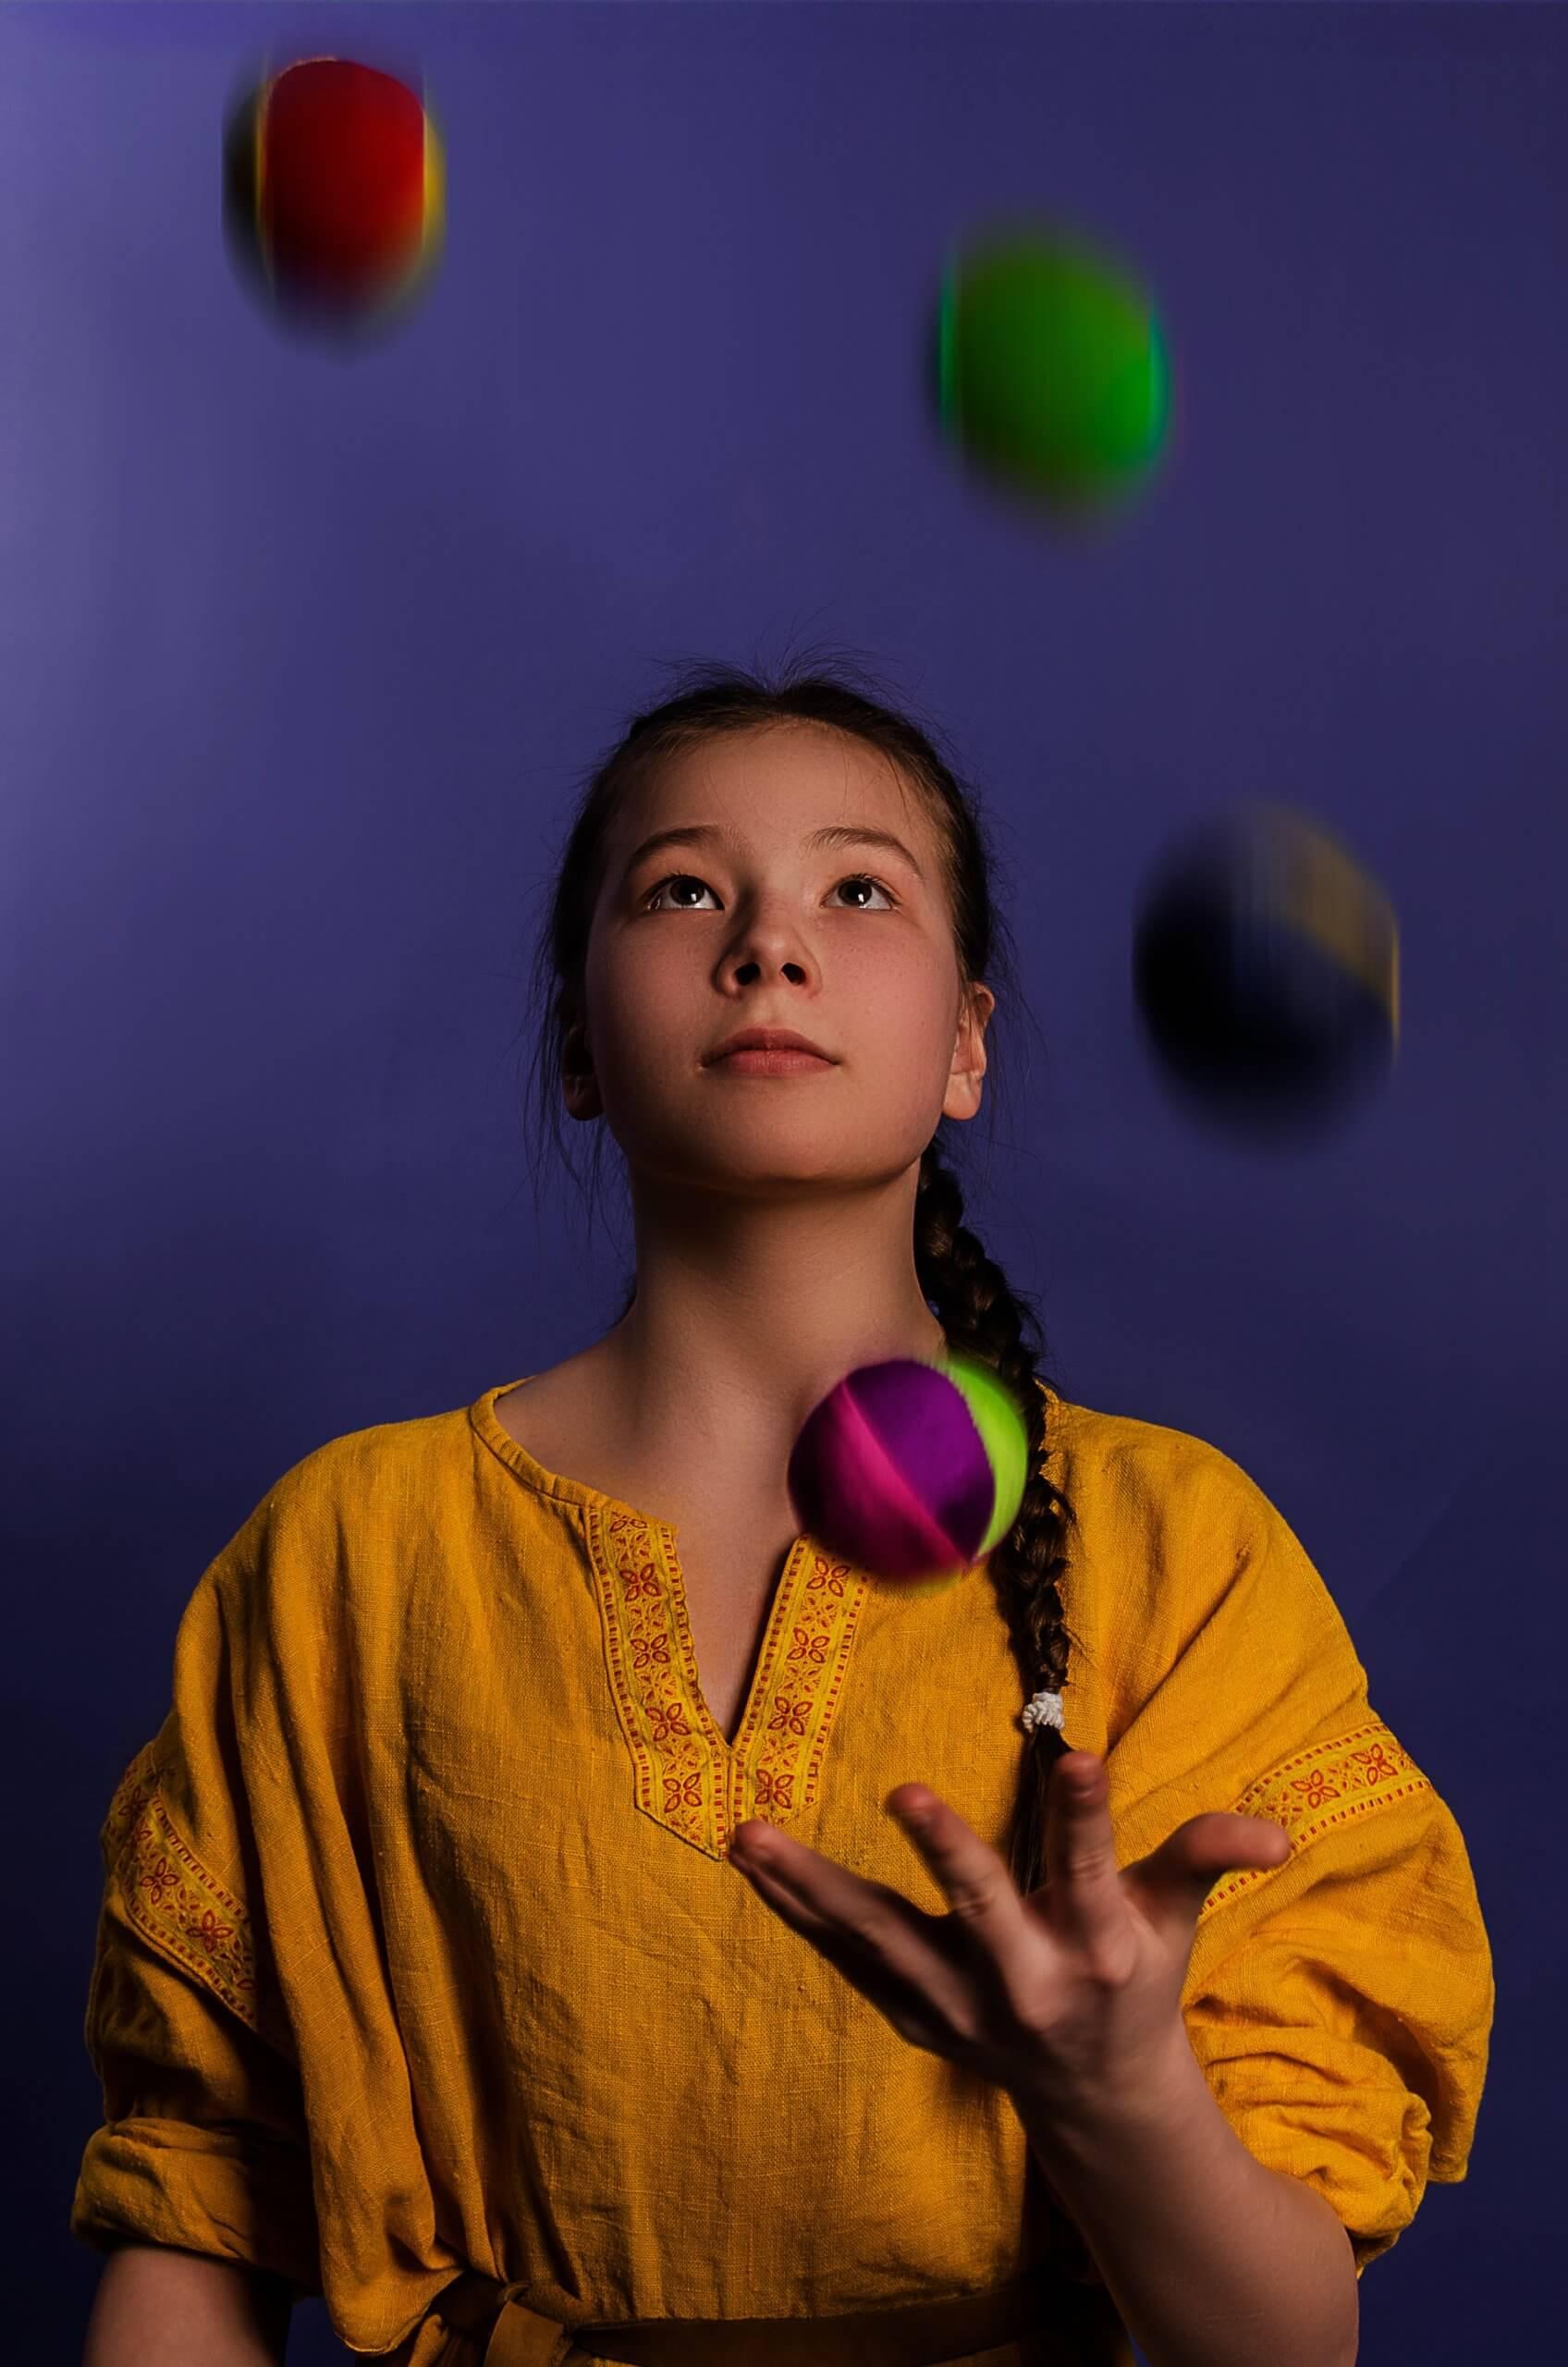 A woman juggles lots of different balls